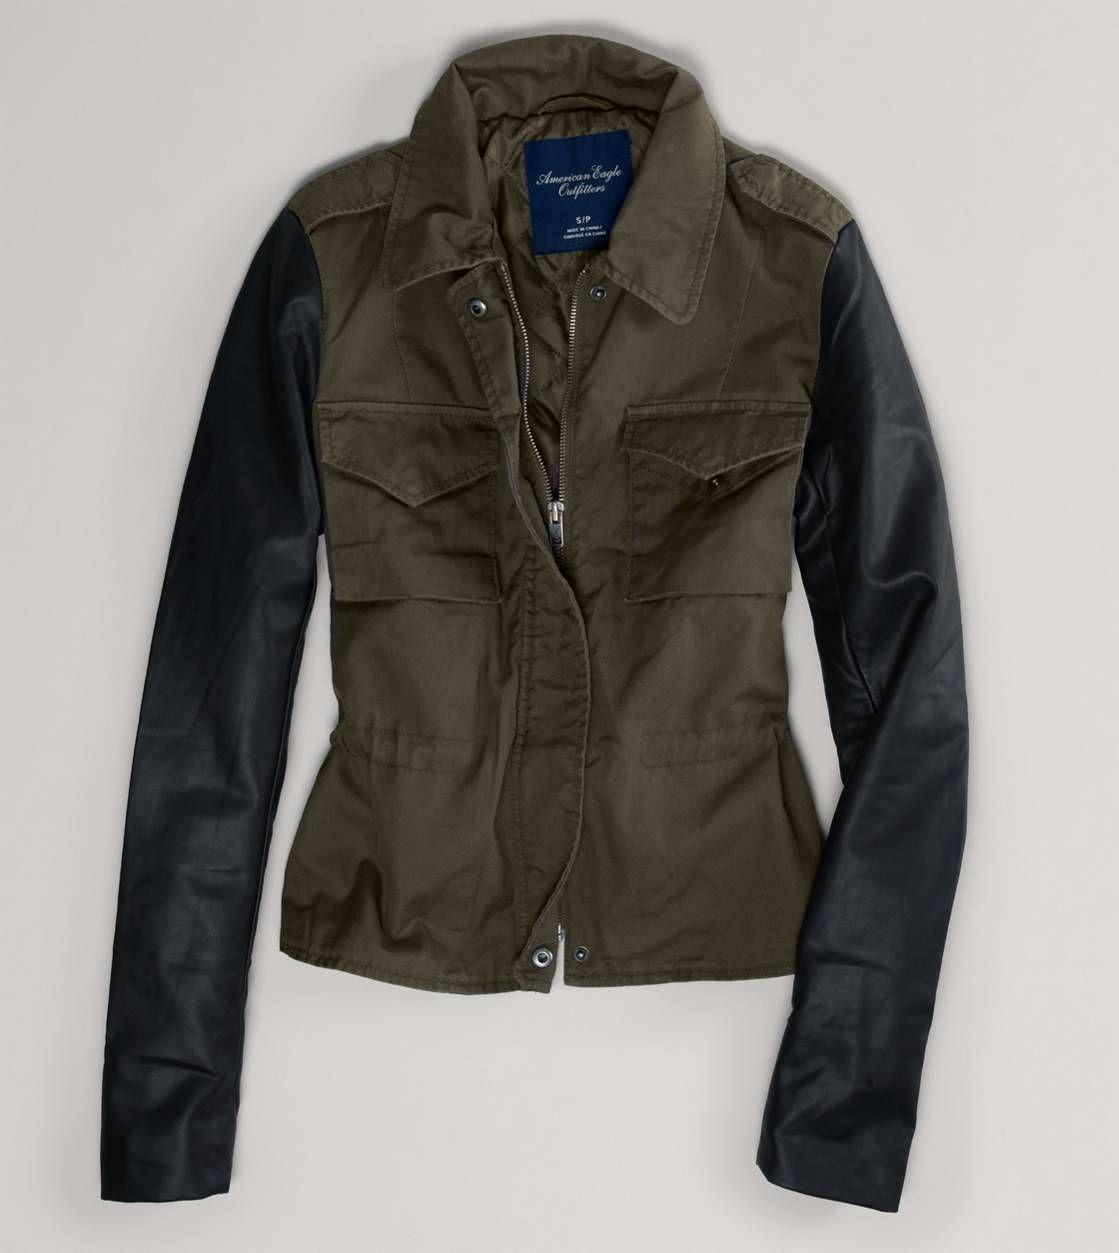 Nwt american eagle womens xs s m l xl military jacket olive faux ... 9b44326762